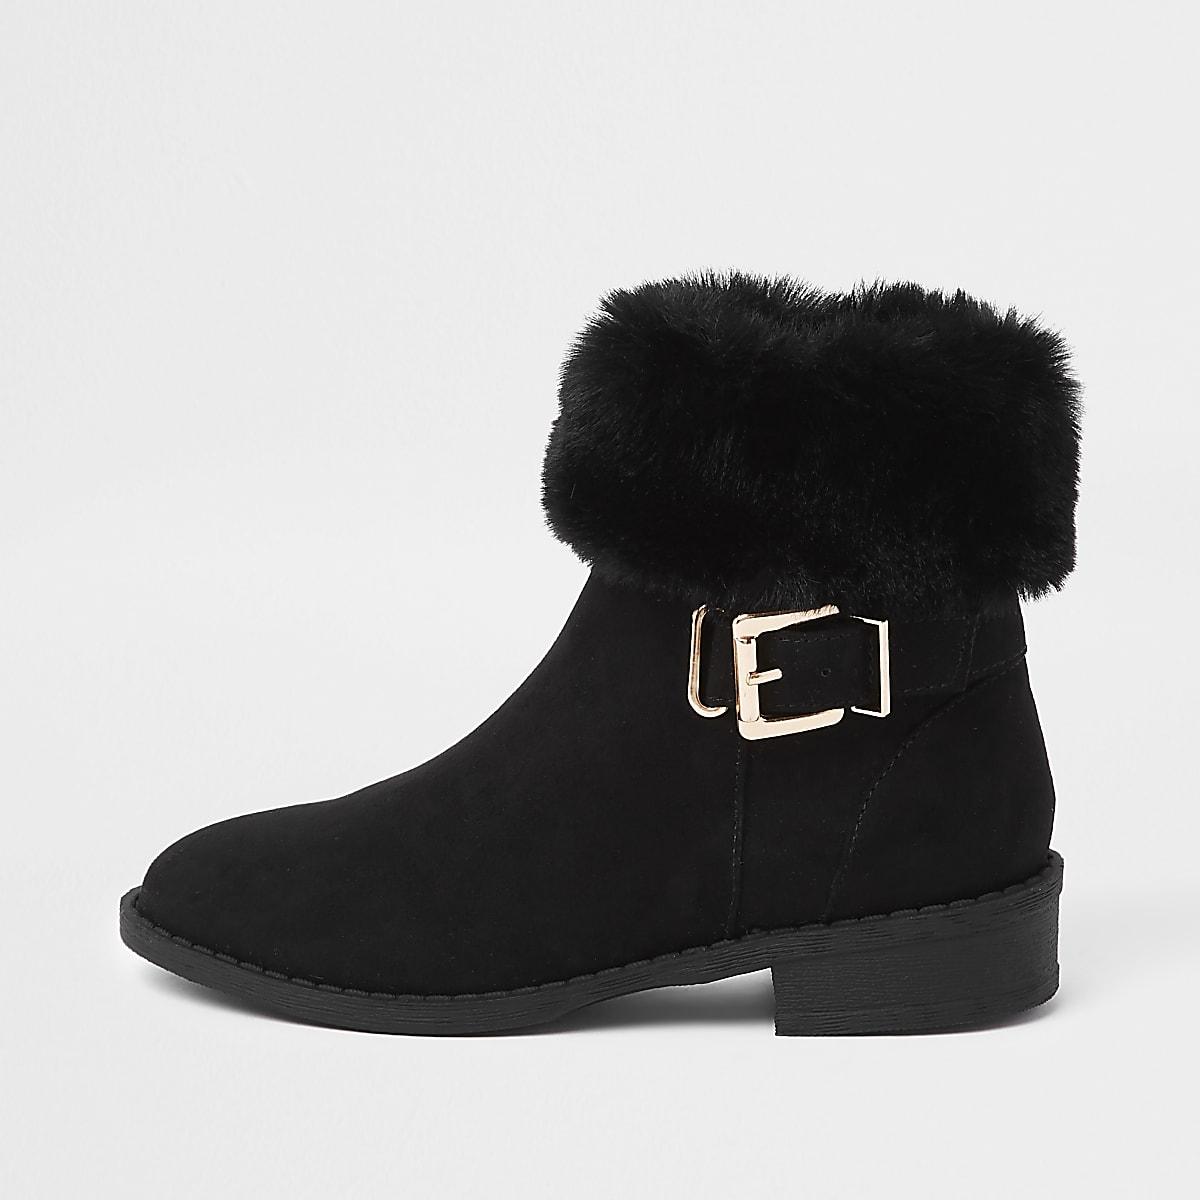 Girls black buckle faux fur cuff boots